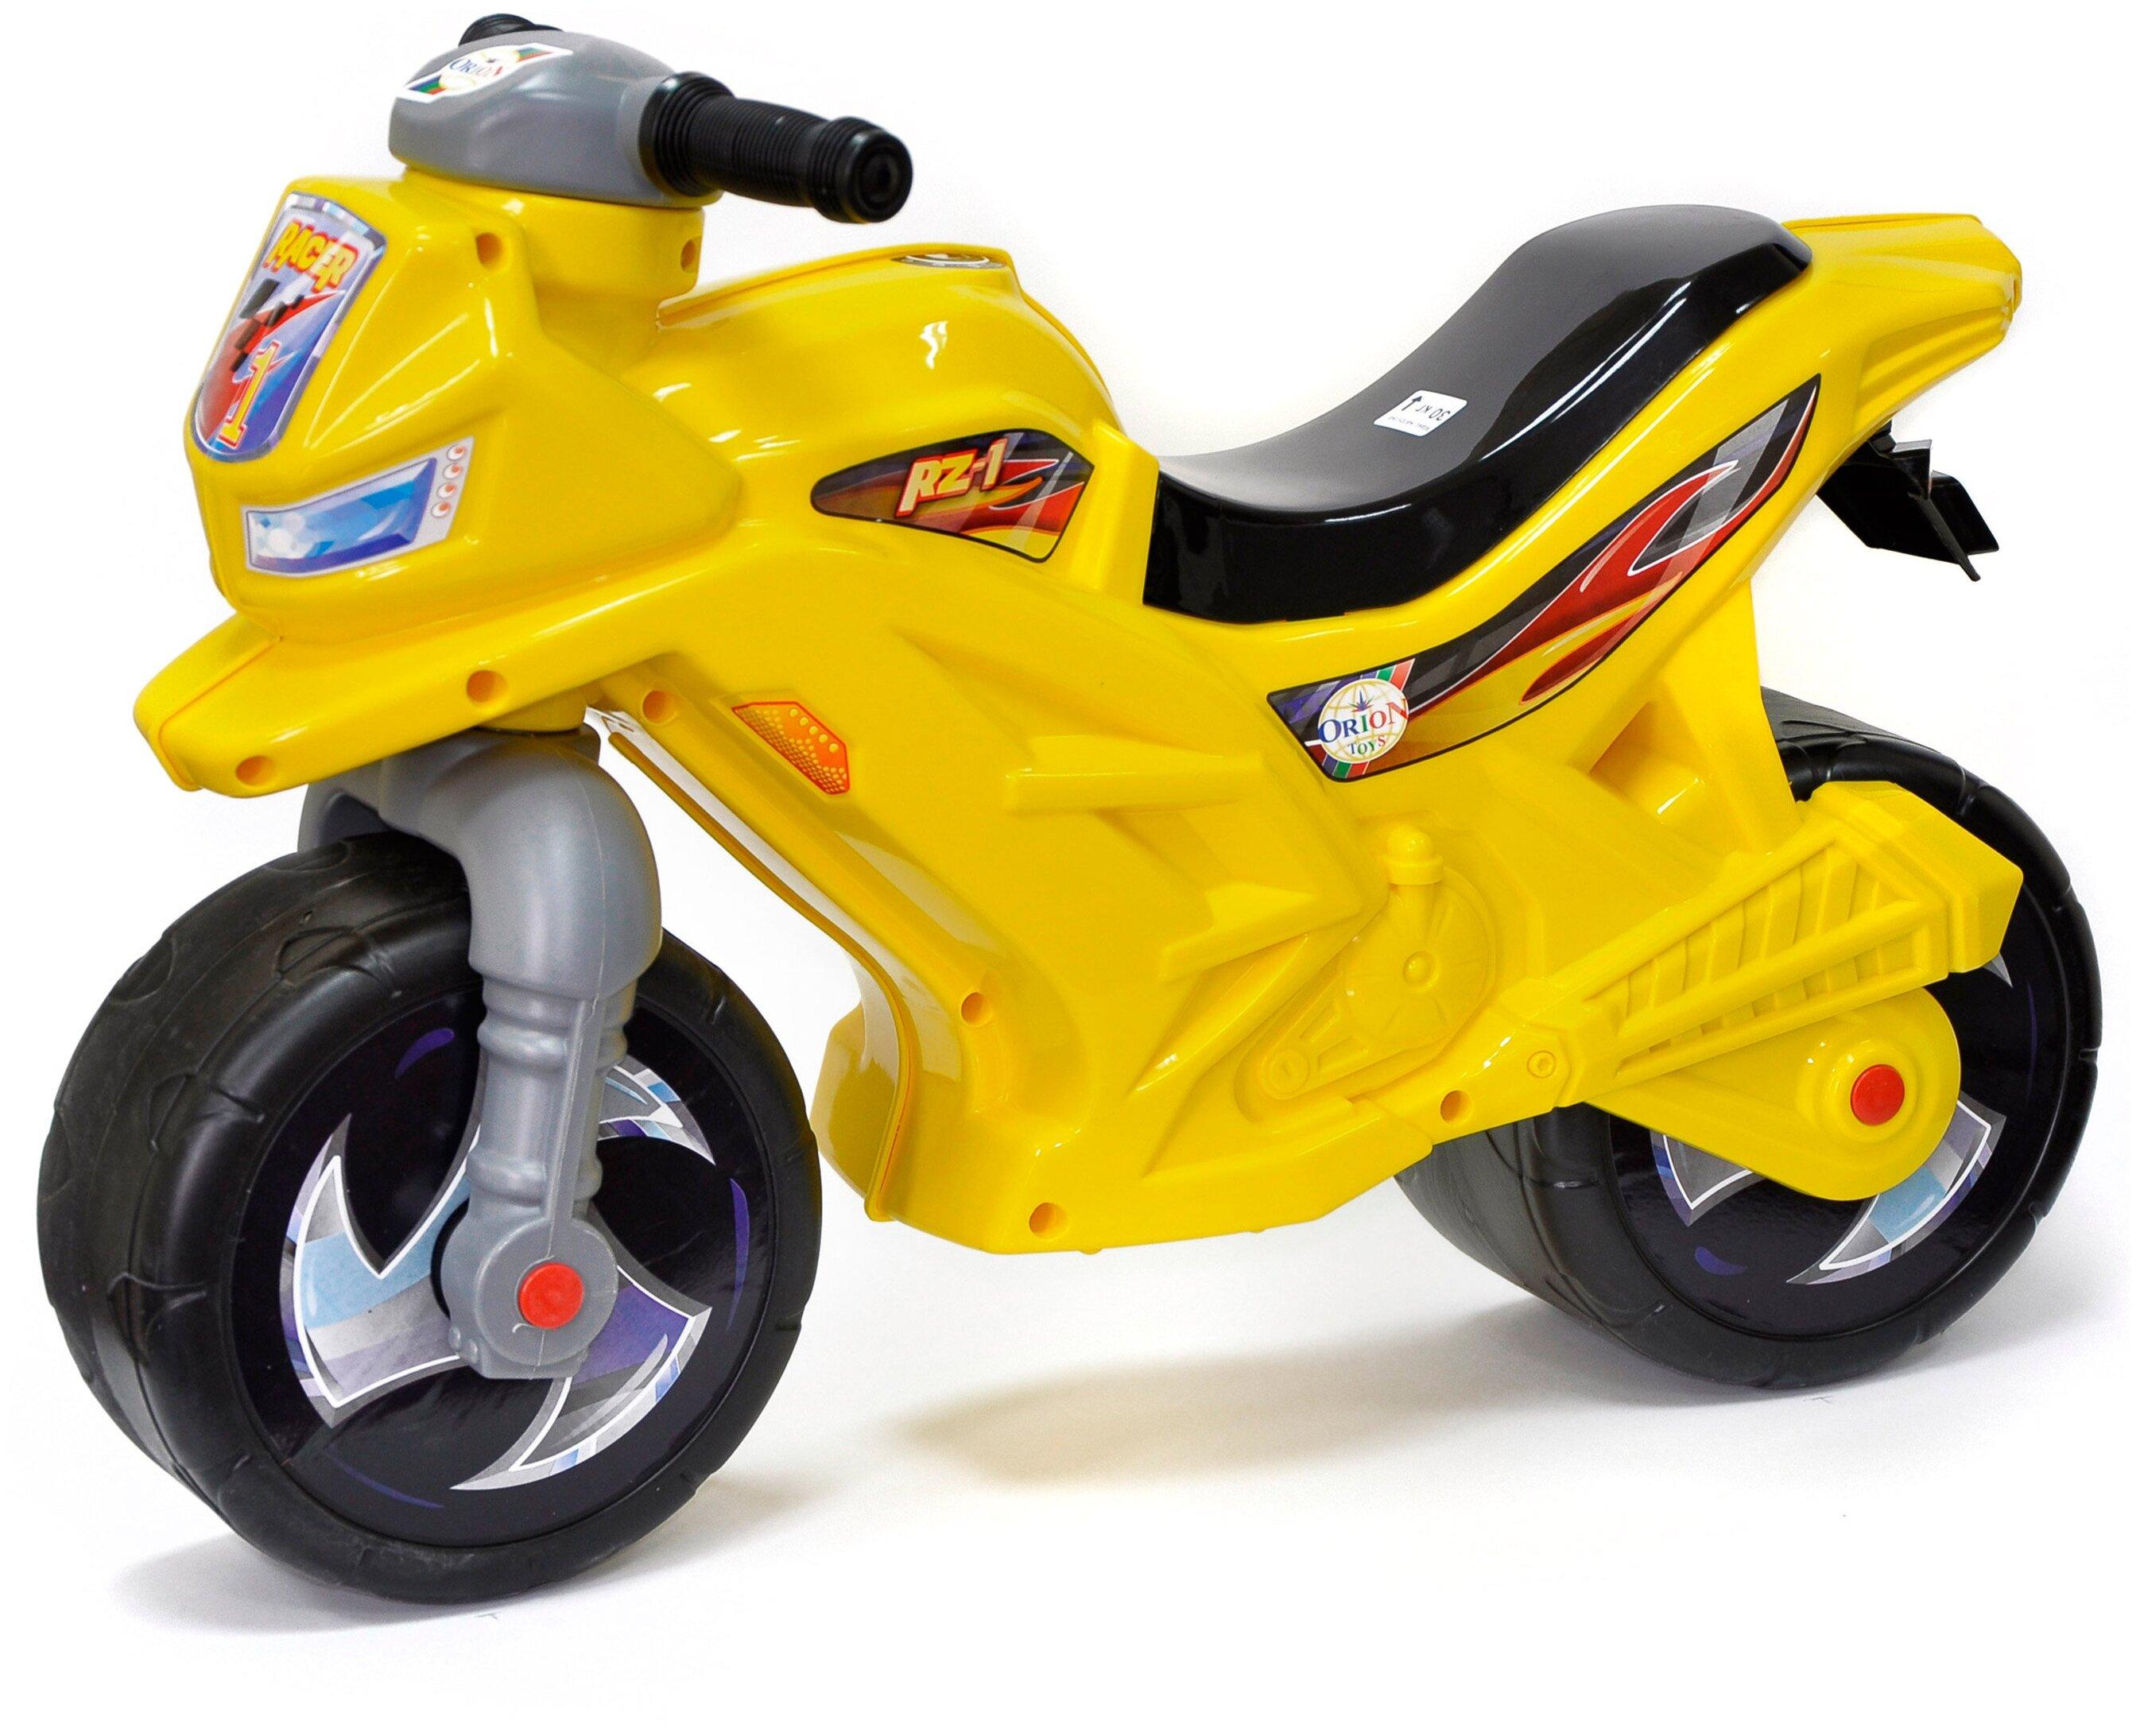 Orion Toys Мотоцикл 2-х колесный - материал: металл, пластик